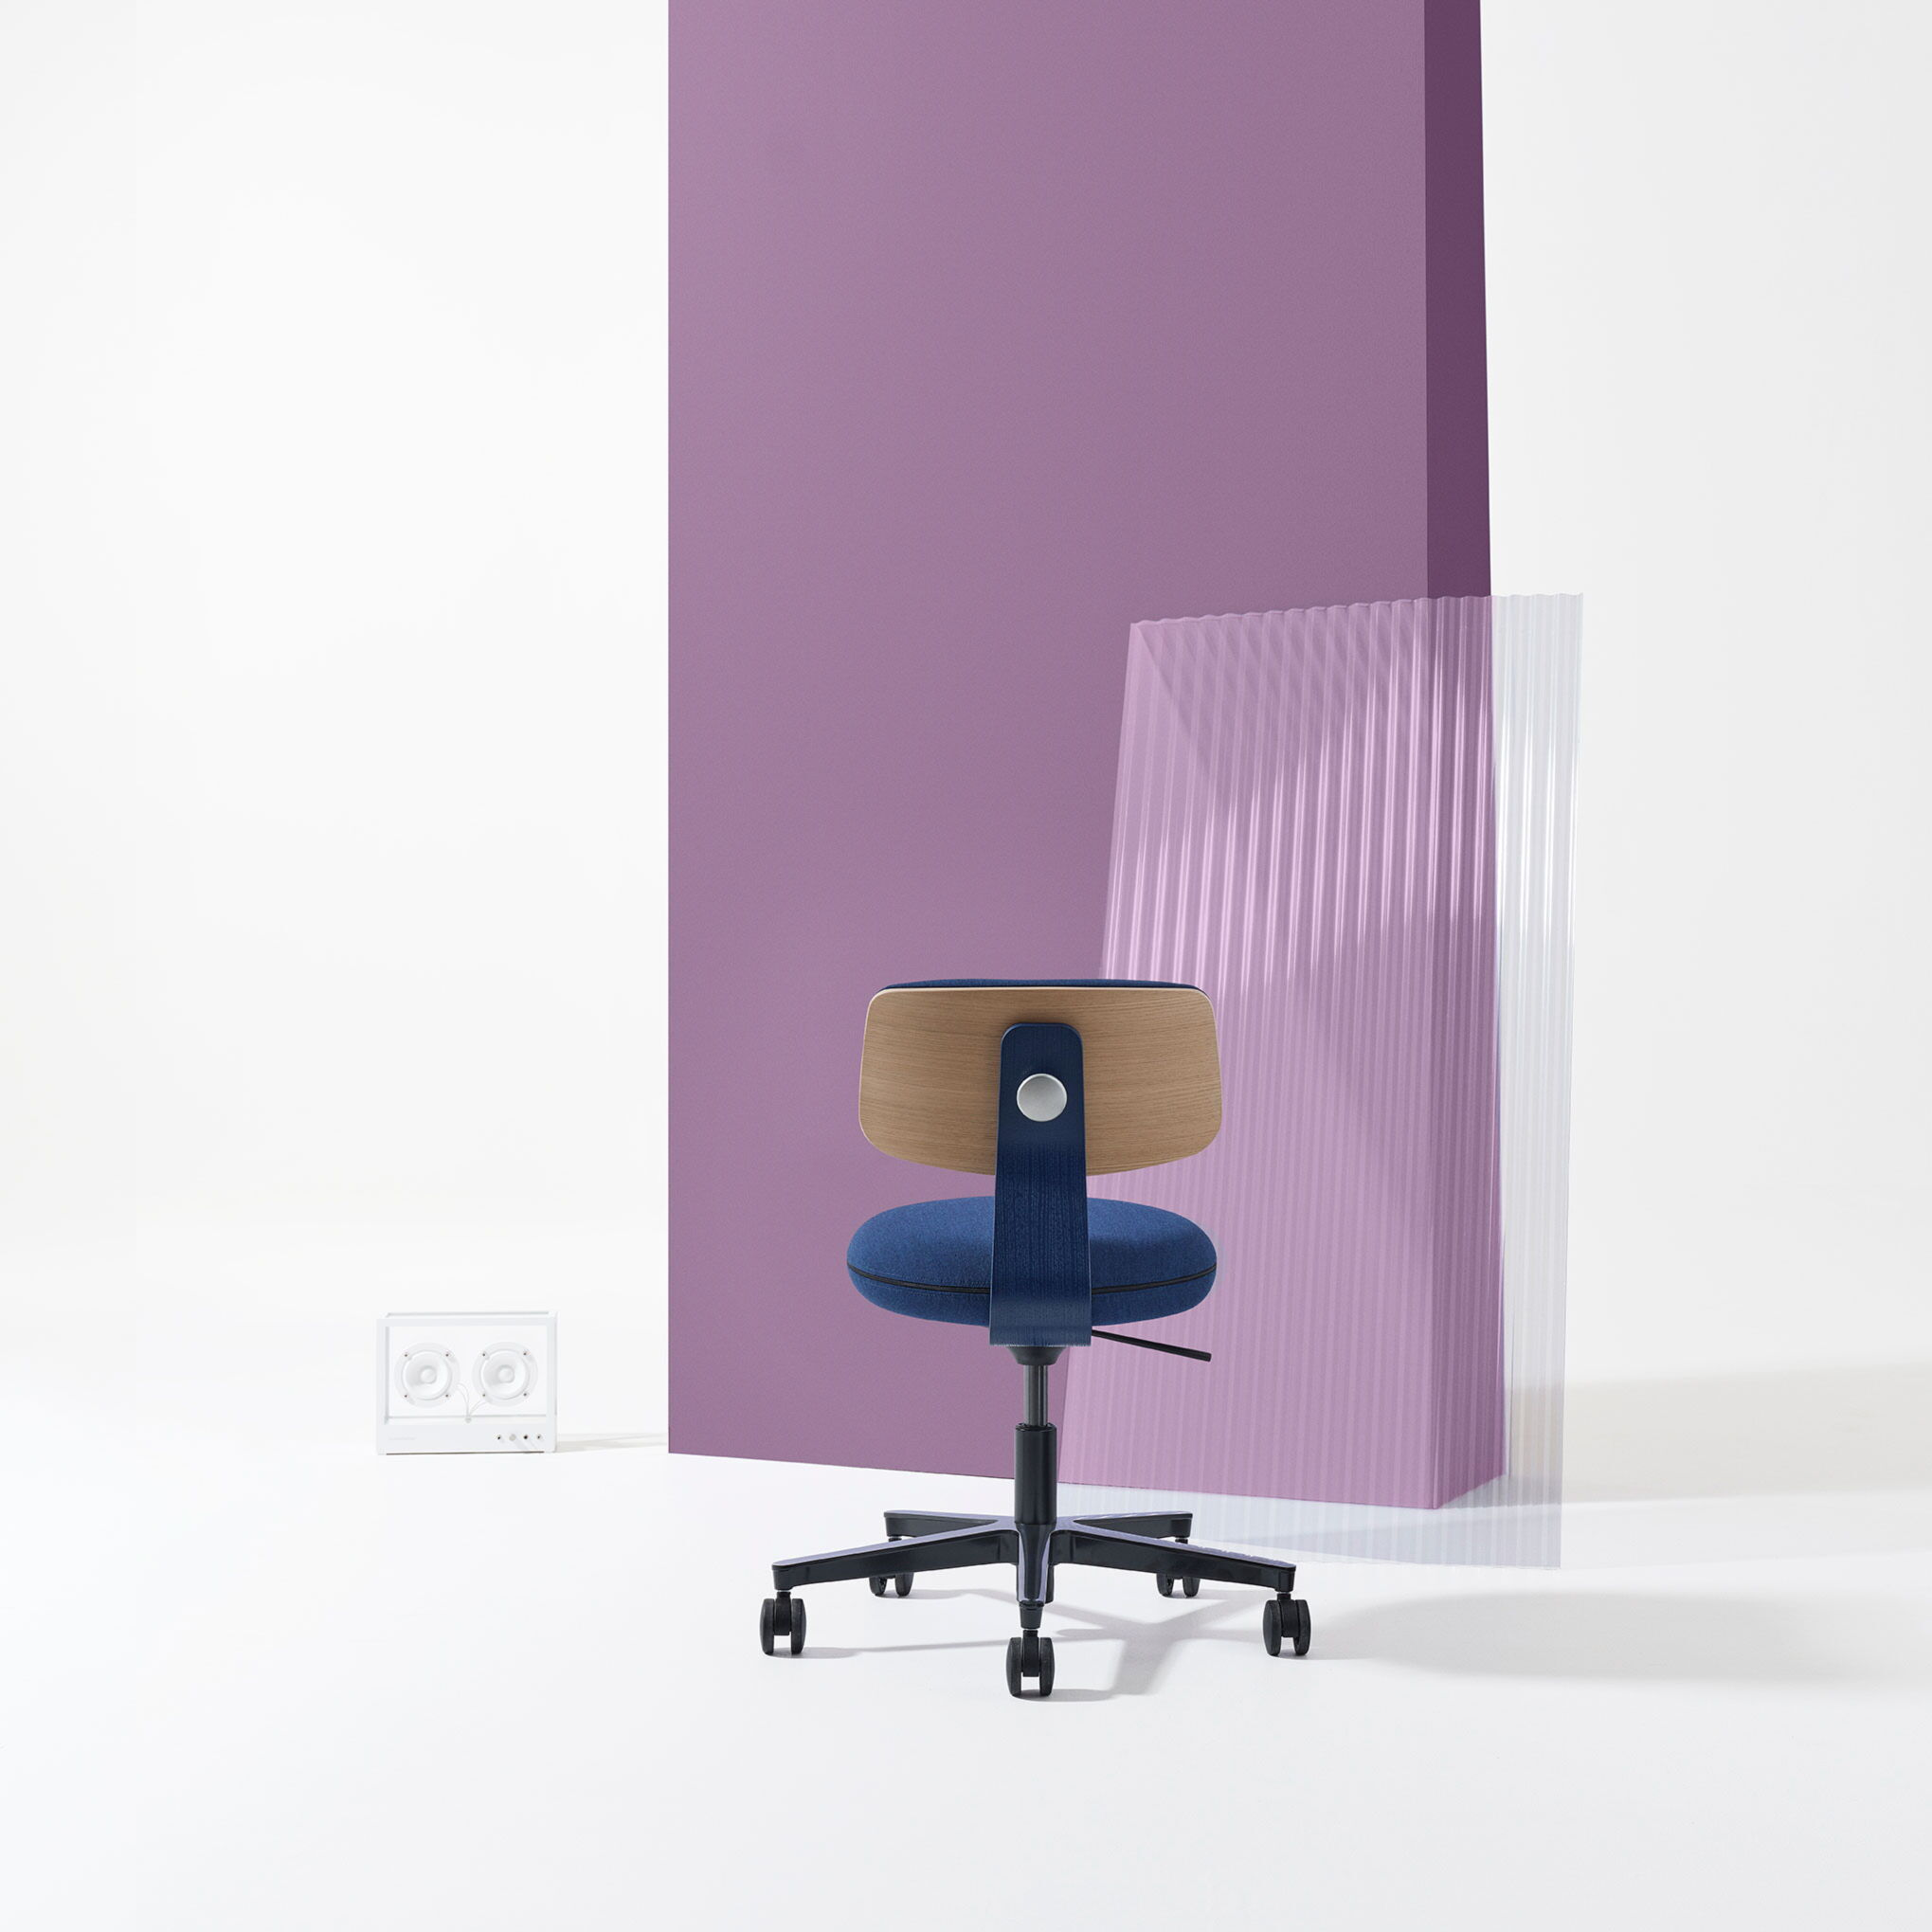 Savo 360 360 mötesstol produktbild 7